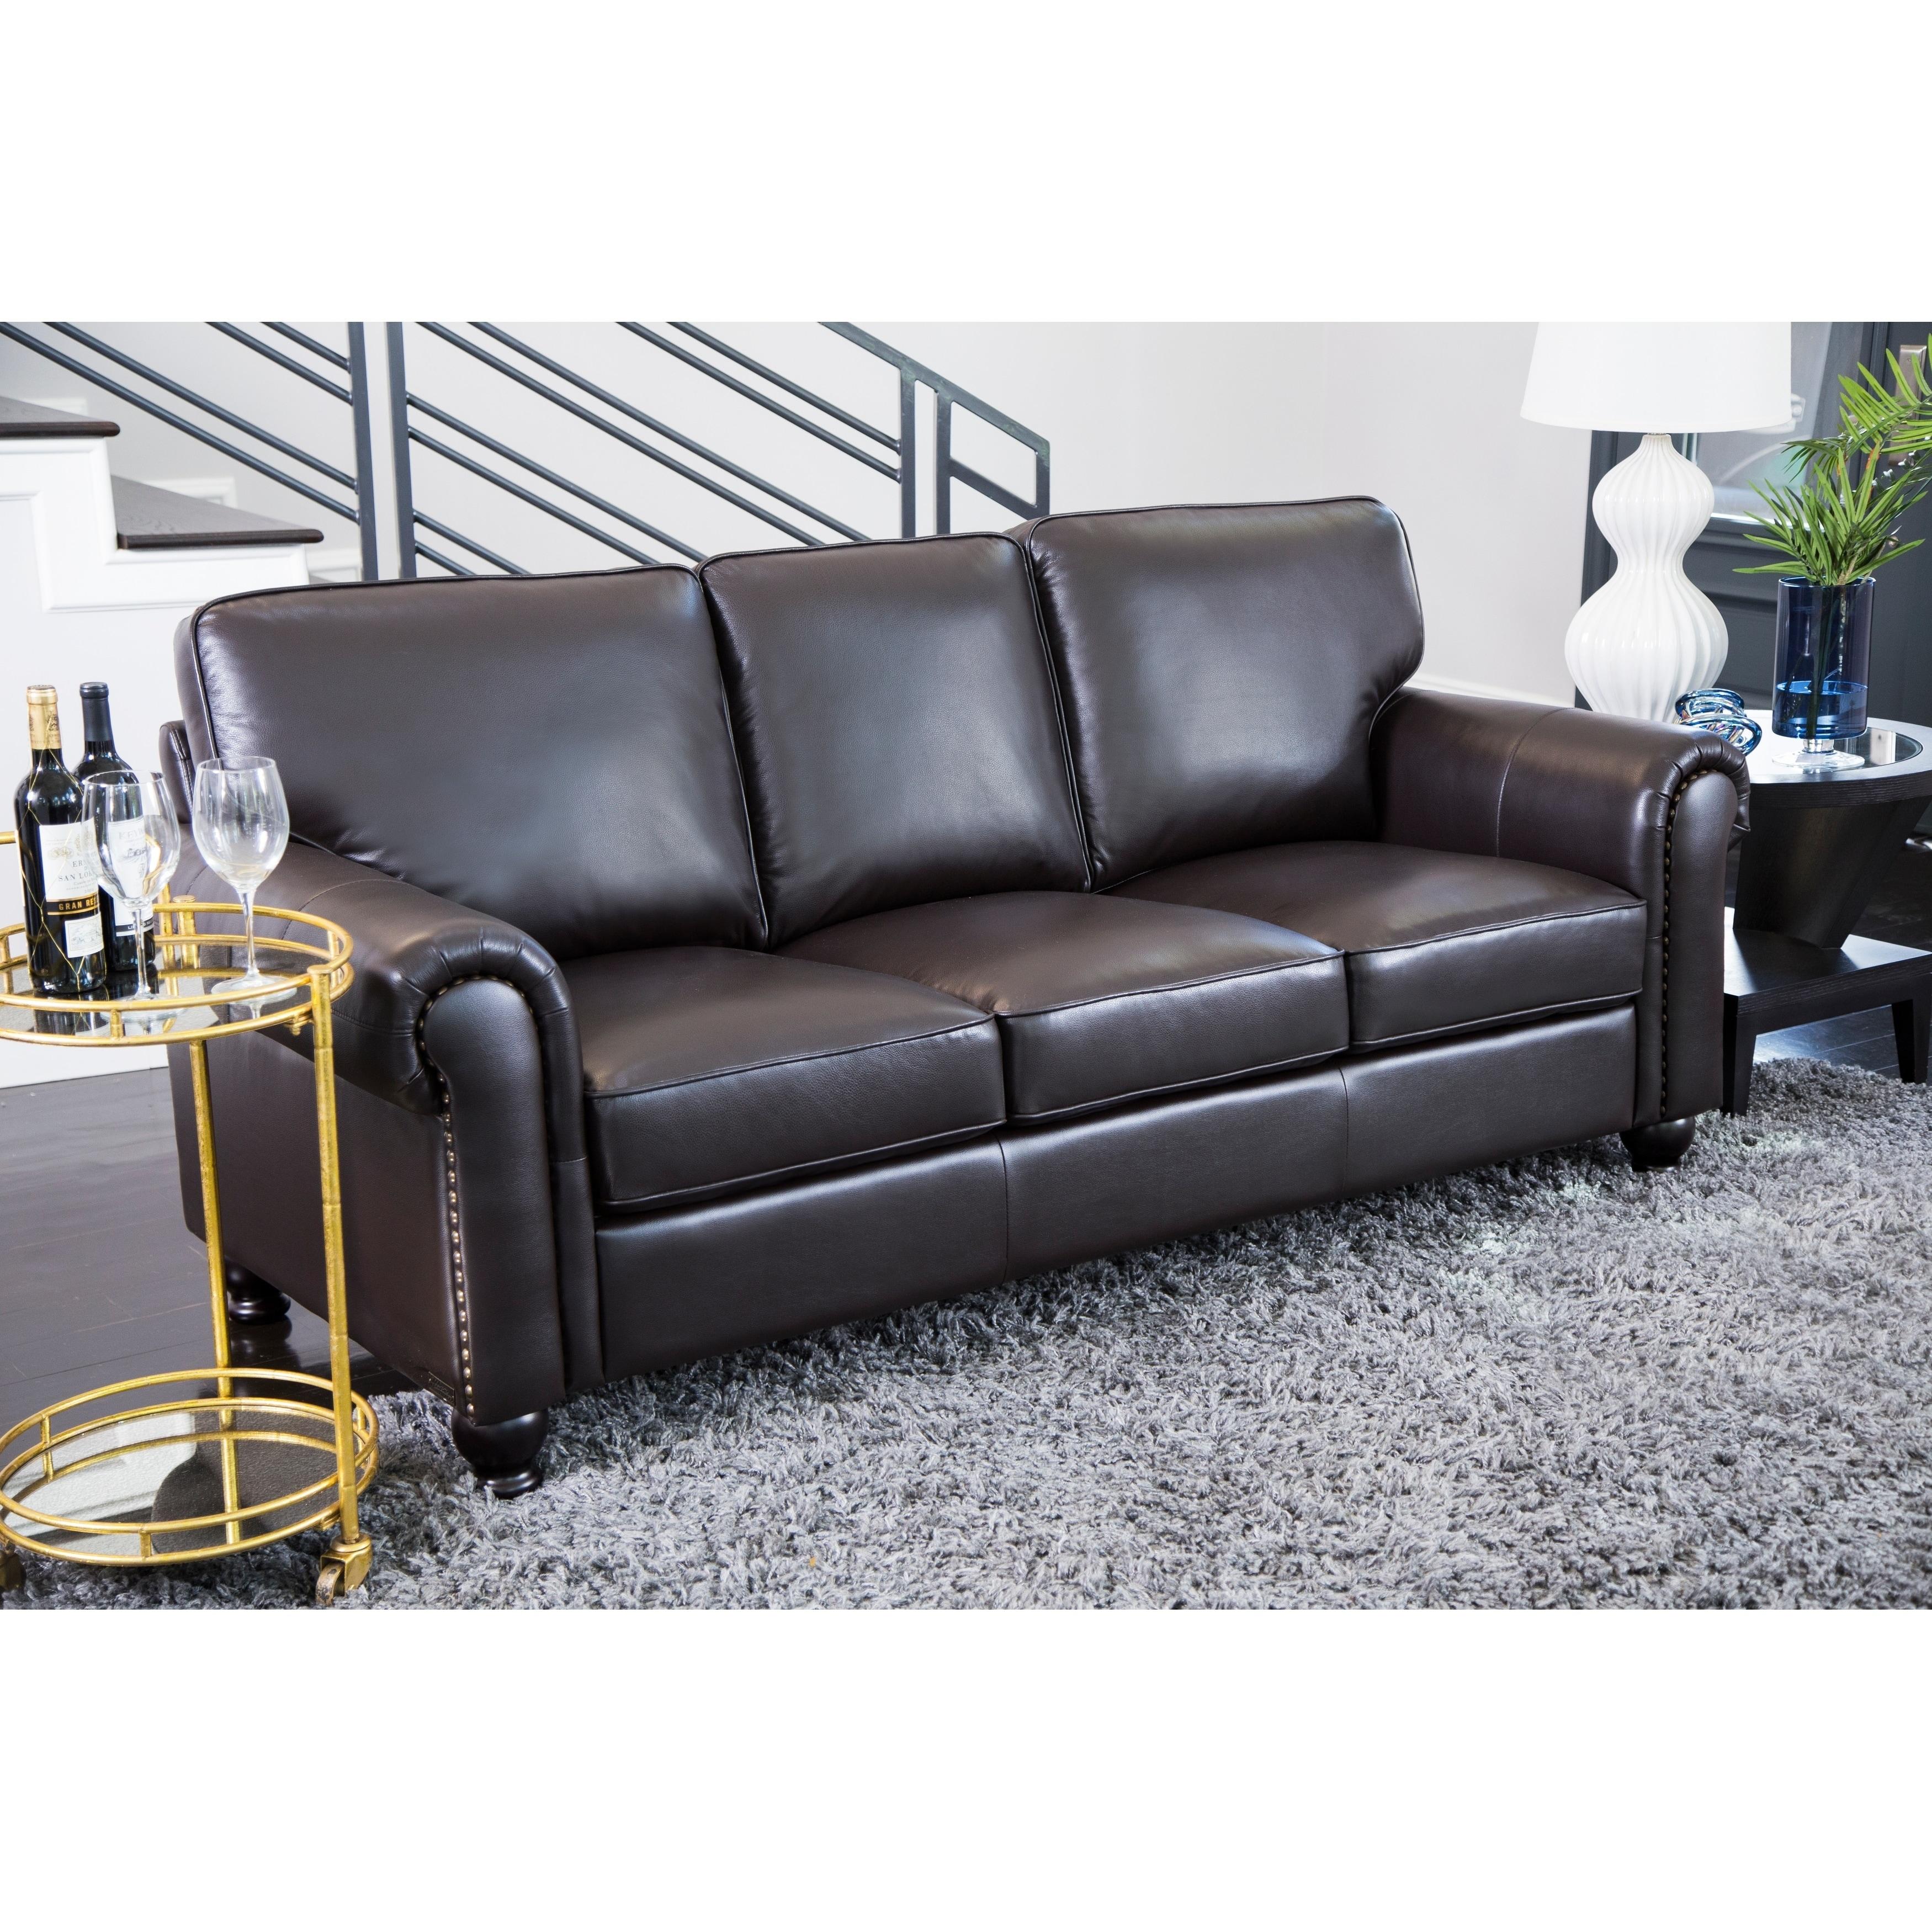 Abbyson Living London Premium Top Grain Leather Sofa And Love Seat